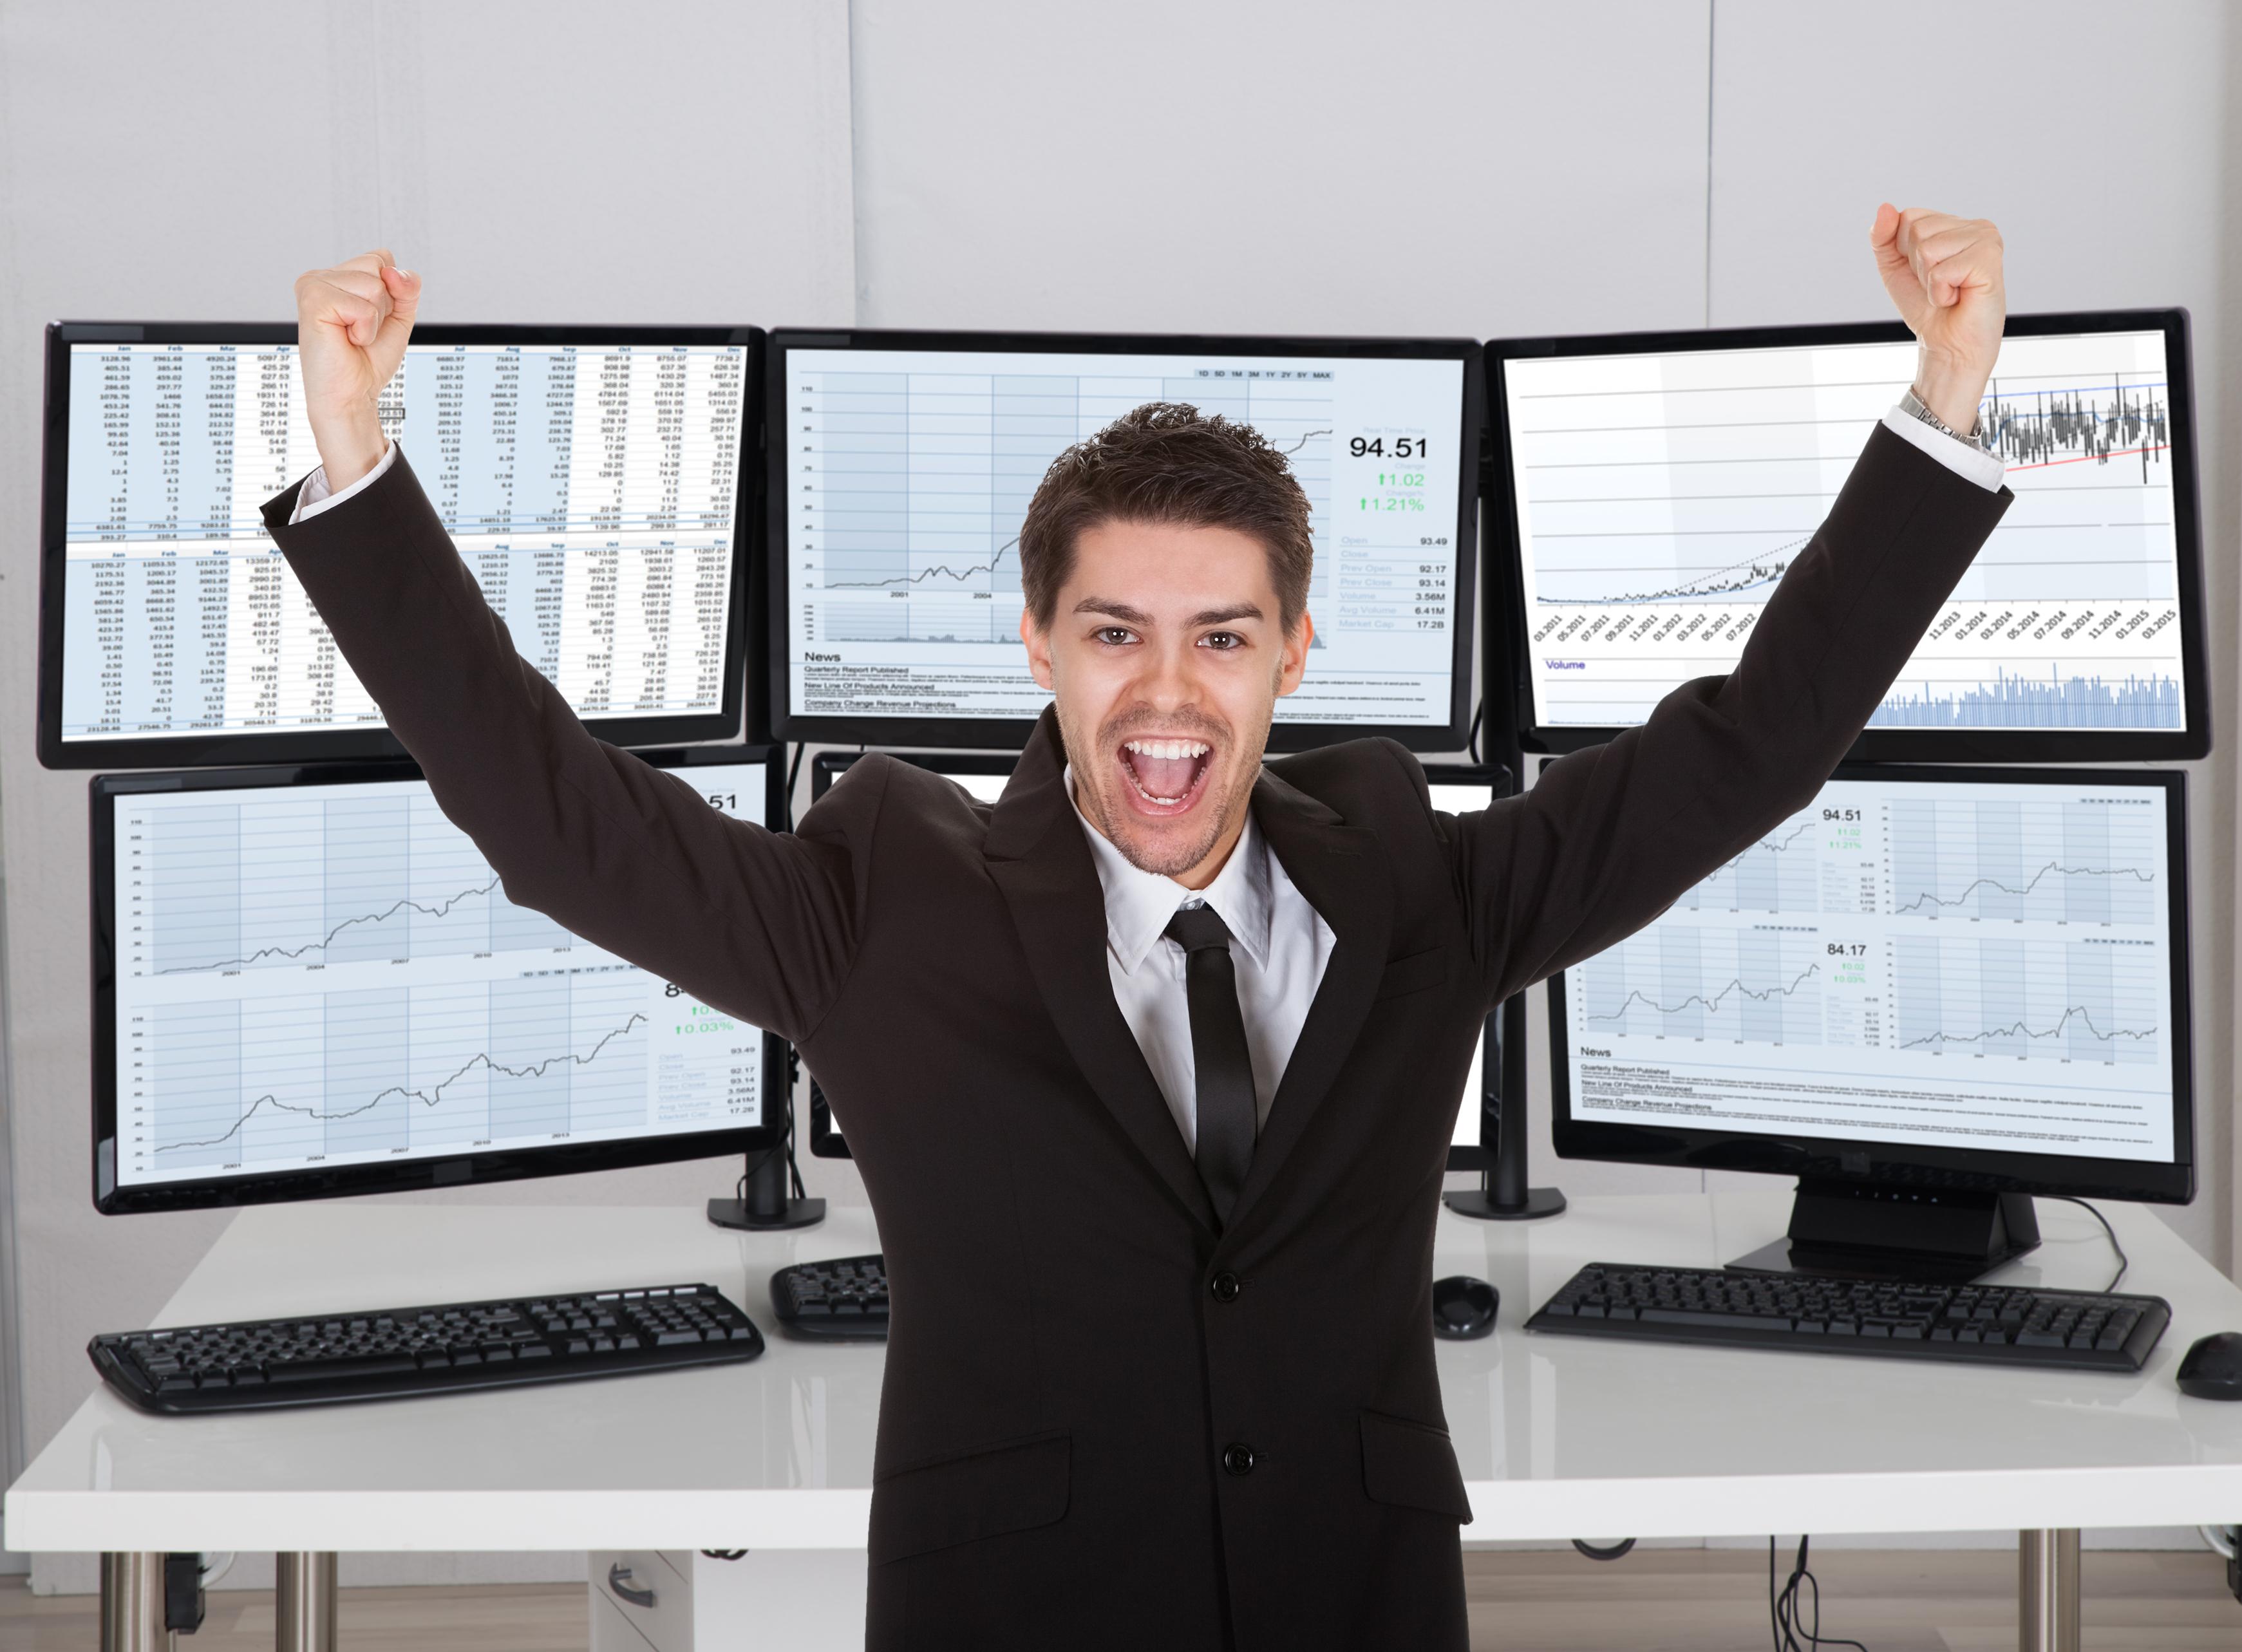 Stock broker celebrating in front of multiple computer screens.